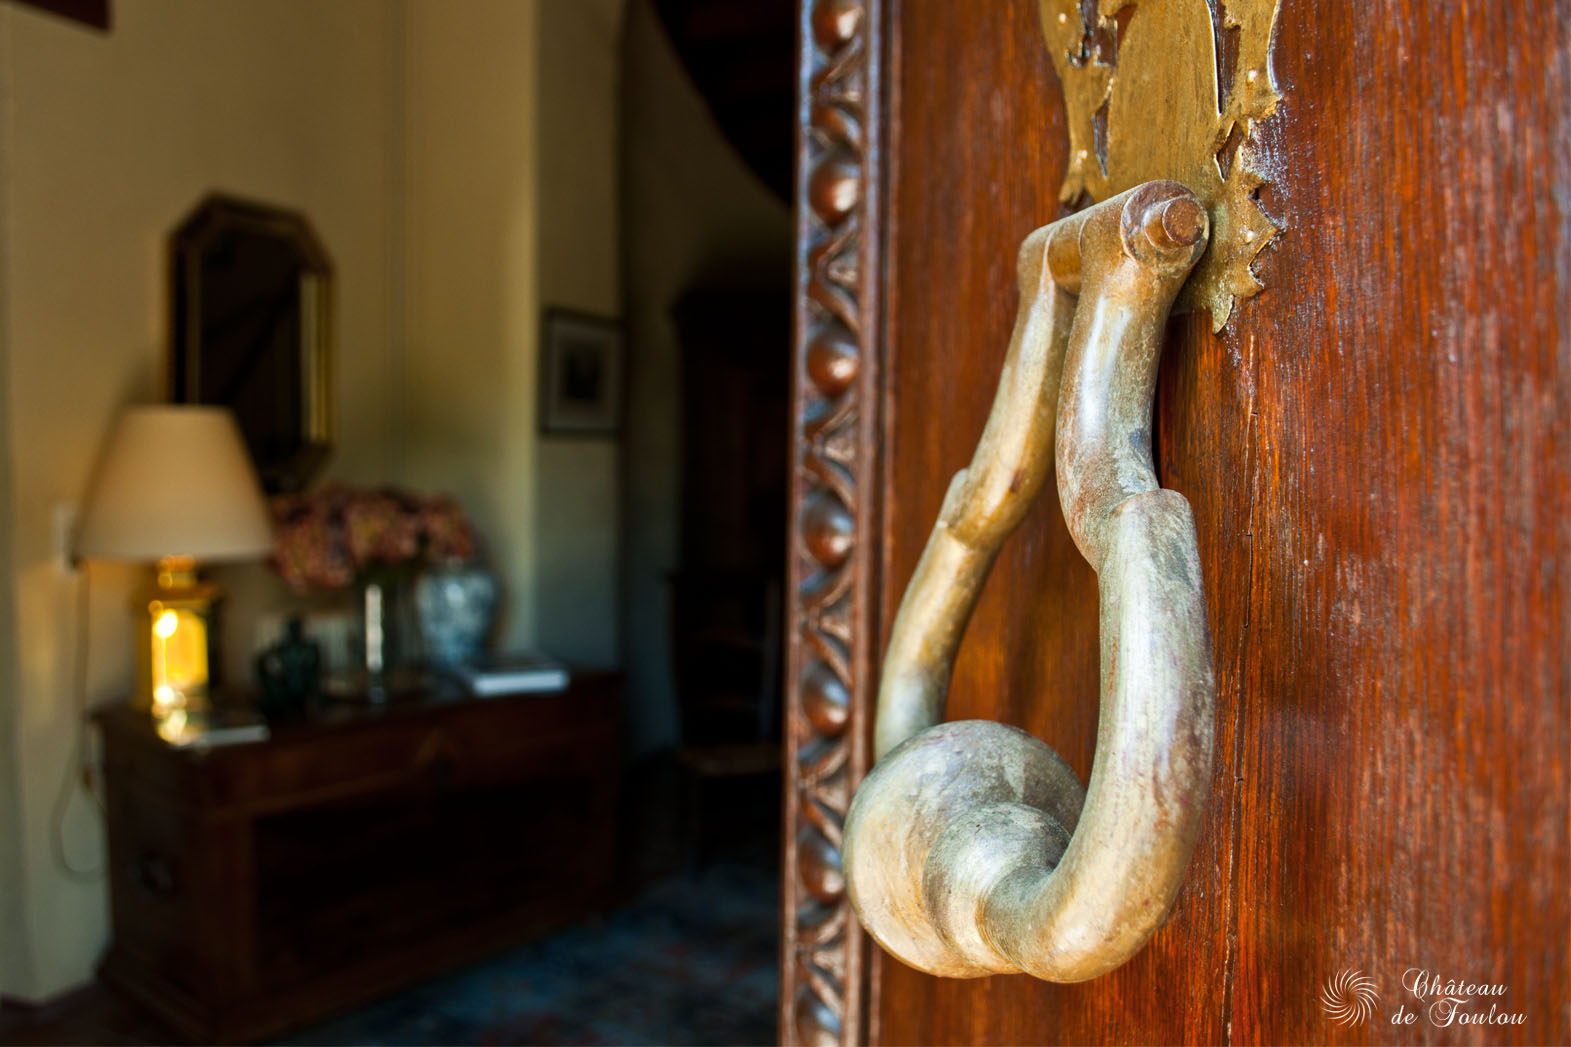 http://www.chateau-de-foulou.com/wp-content/uploads/2014/05/roomfoulou04.jpg